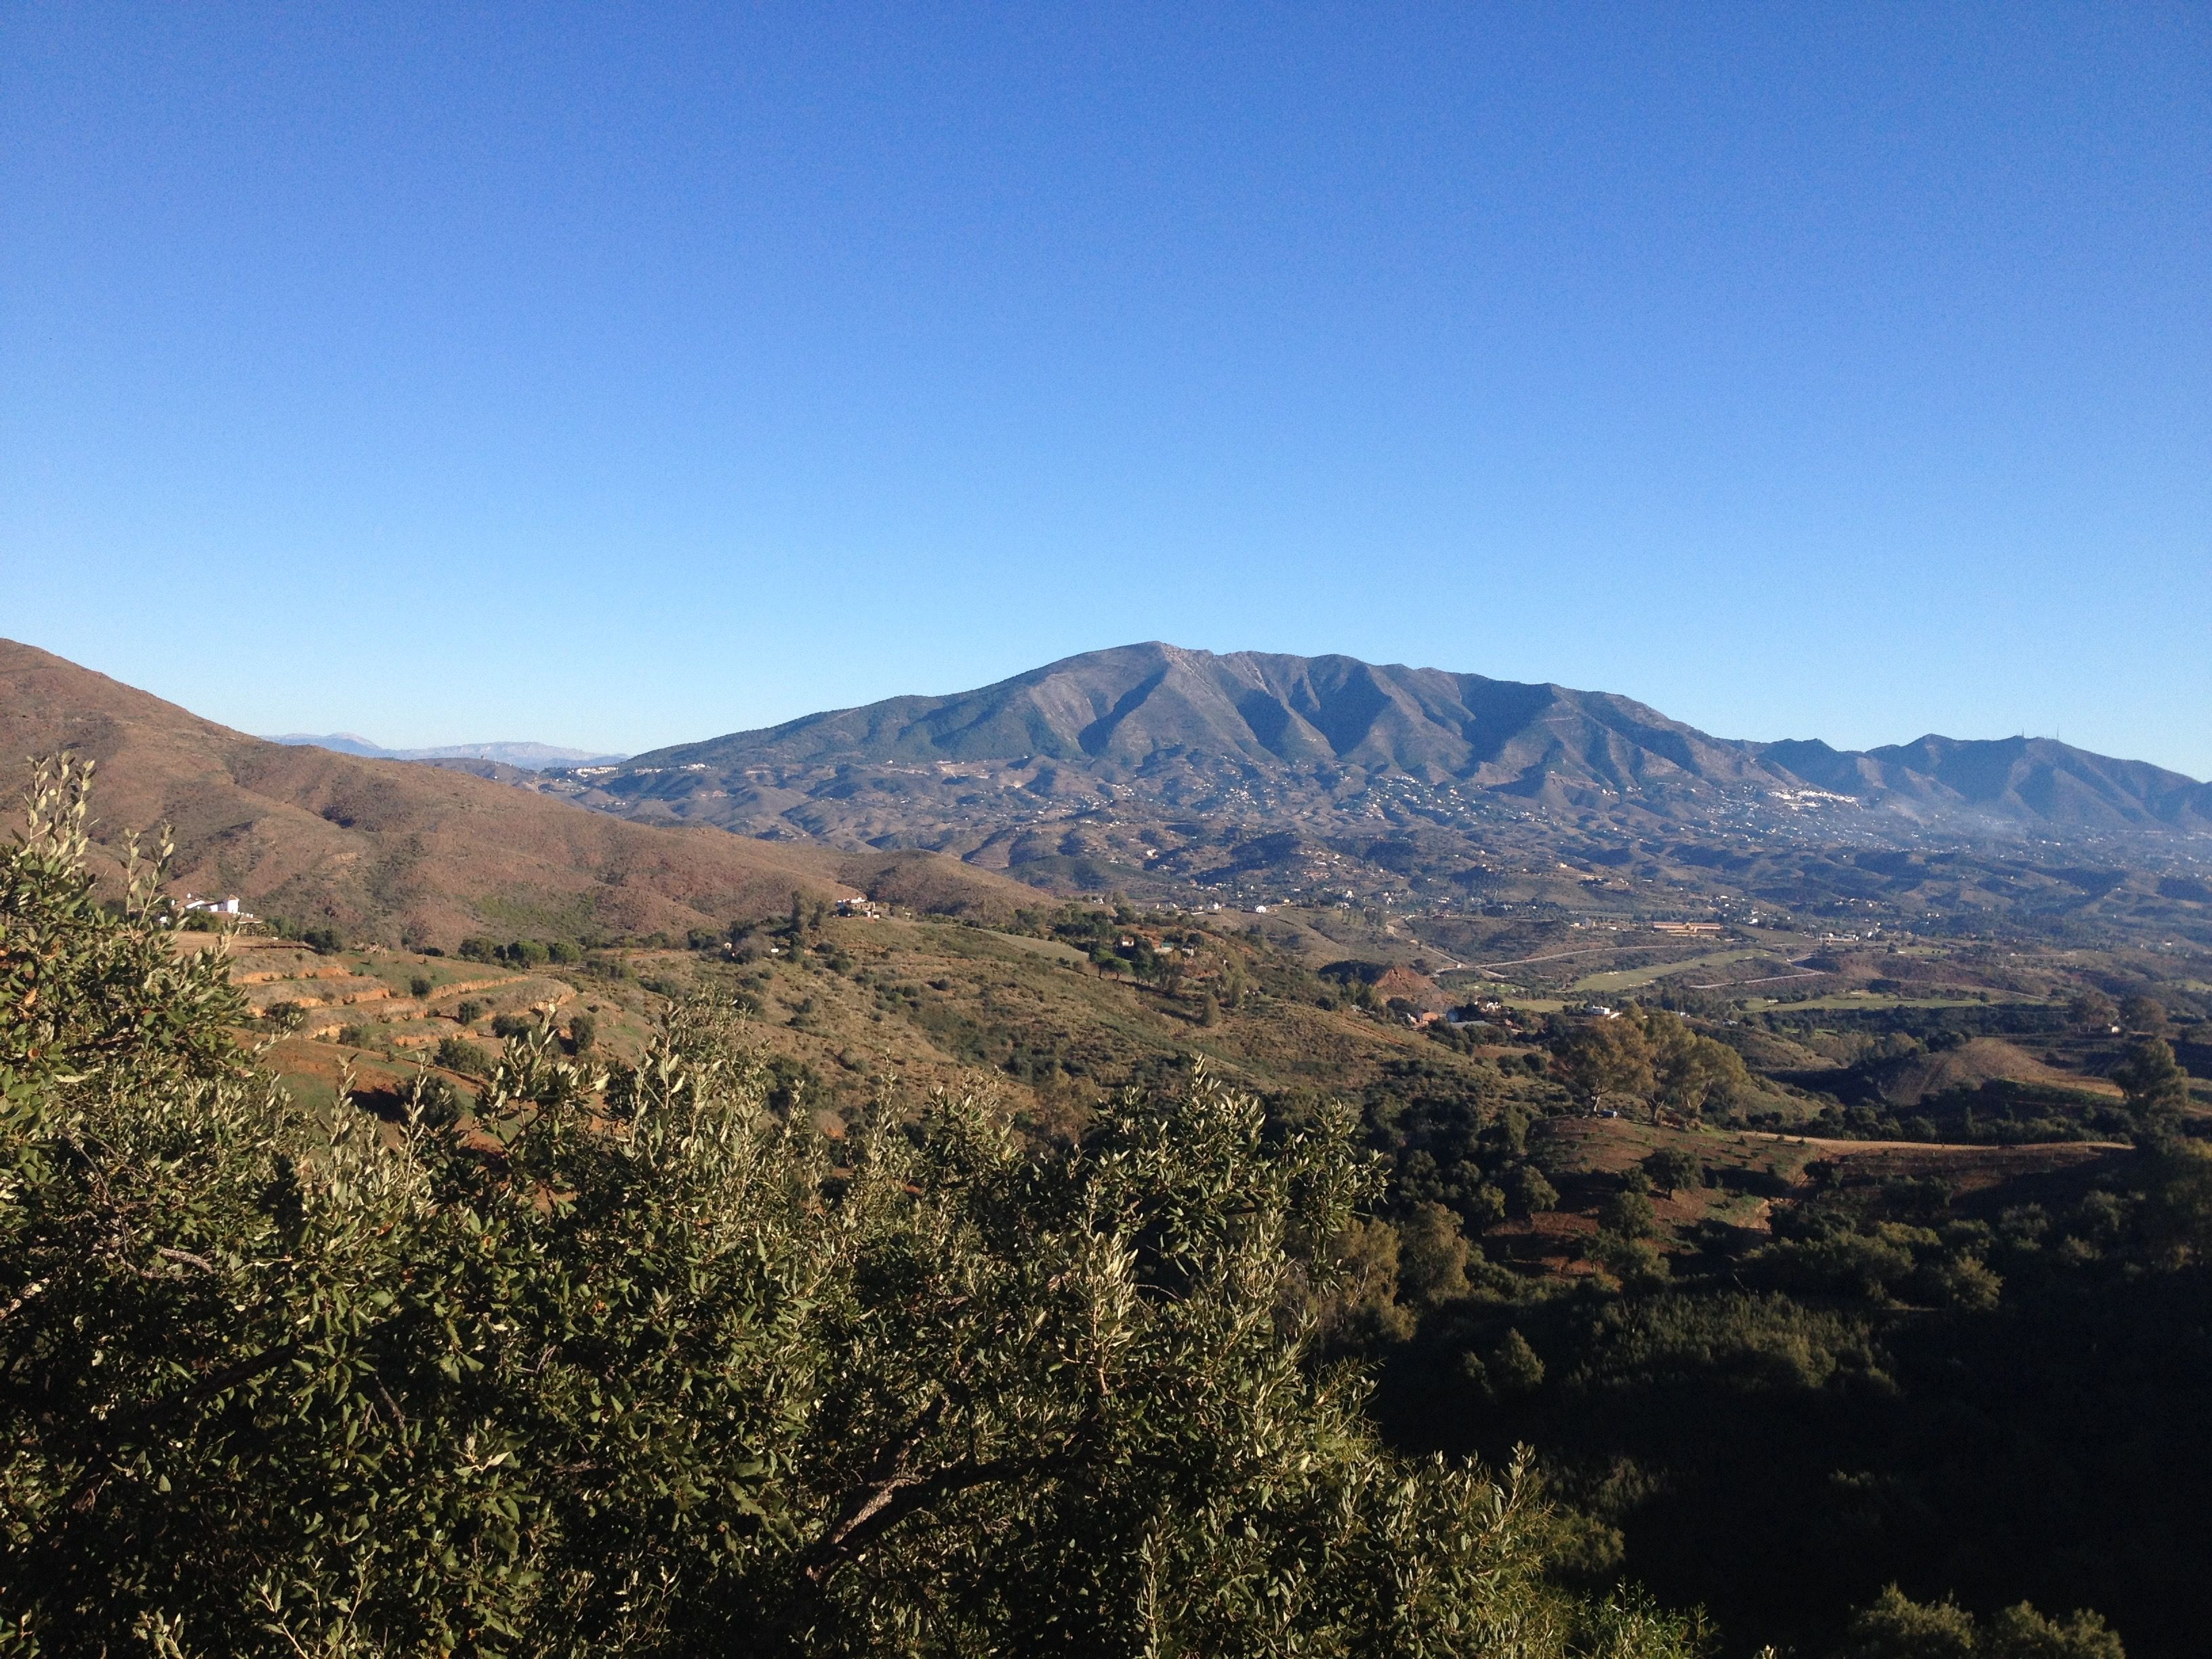 Blick Richtung Mijas Pueblo, Nord-Ost, Rückseite La Mairena - Malaga - Andalusien - Spanien (20171201_10:30)